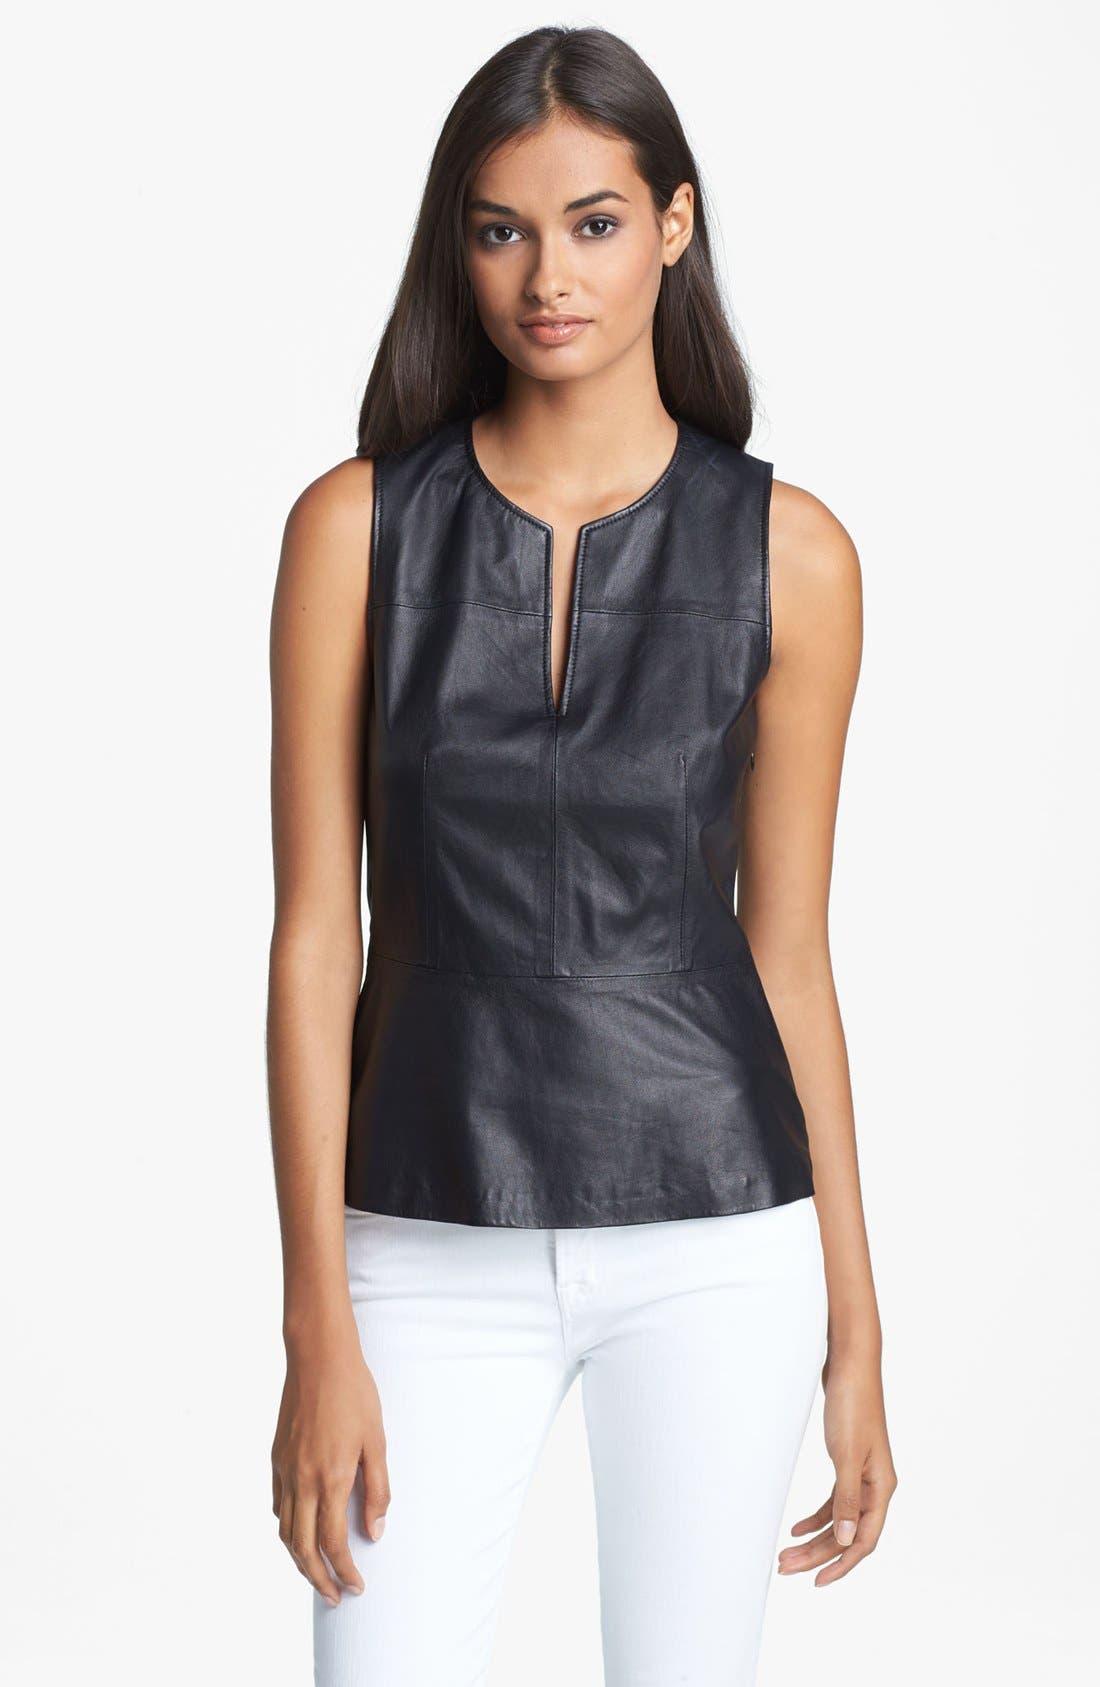 'Etia L.' Leather Top,                             Main thumbnail 1, color,                             001